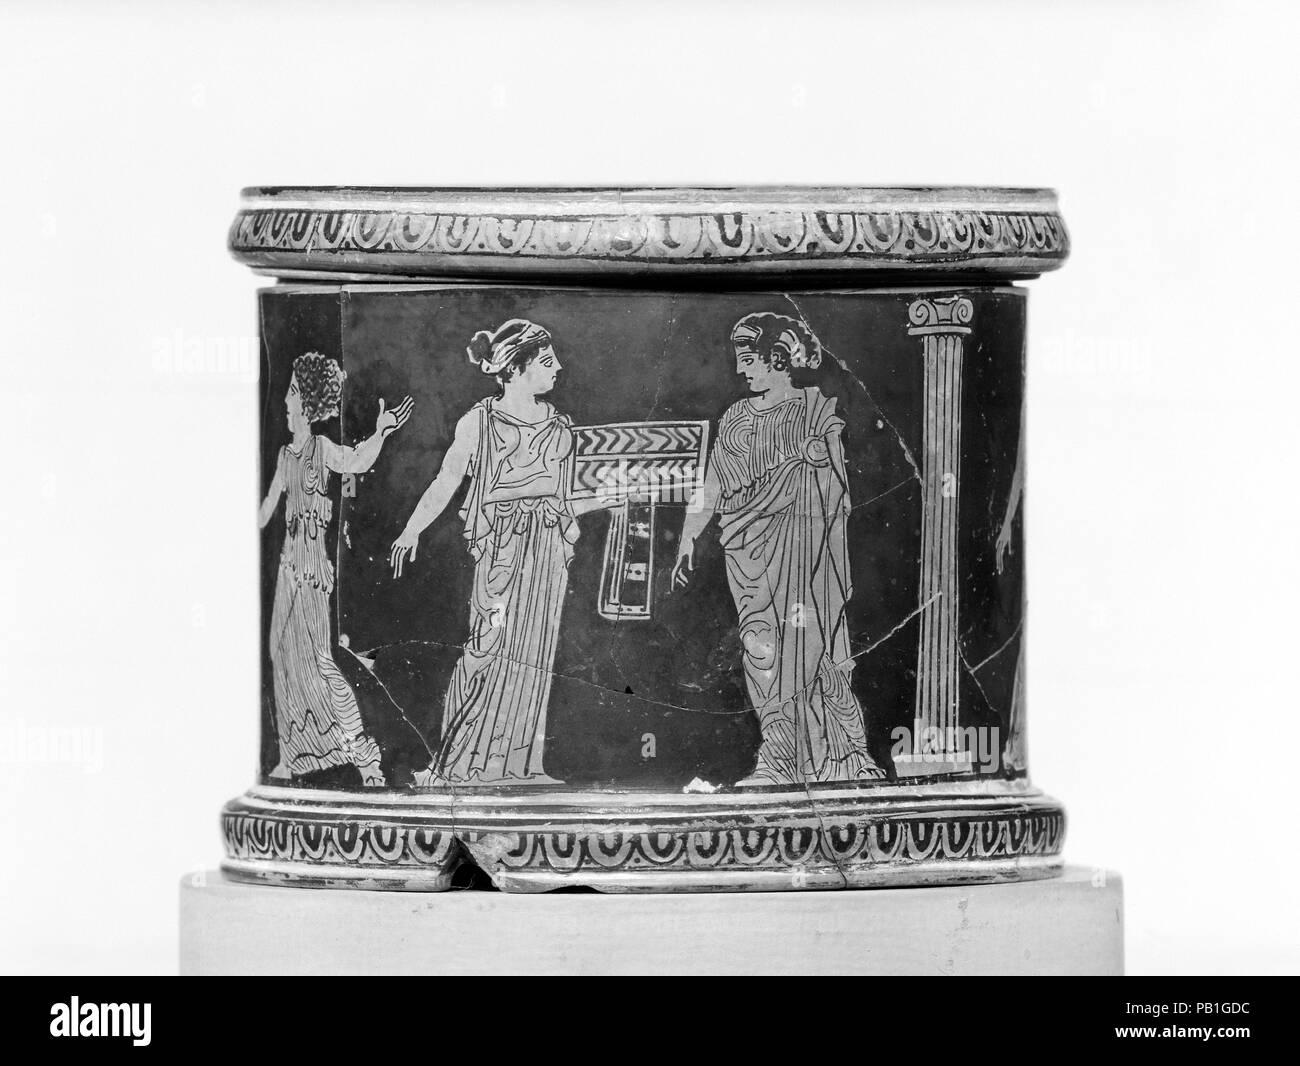 Terracotta Pyxis Box Culture Greek Attic Dimensions H 3 14